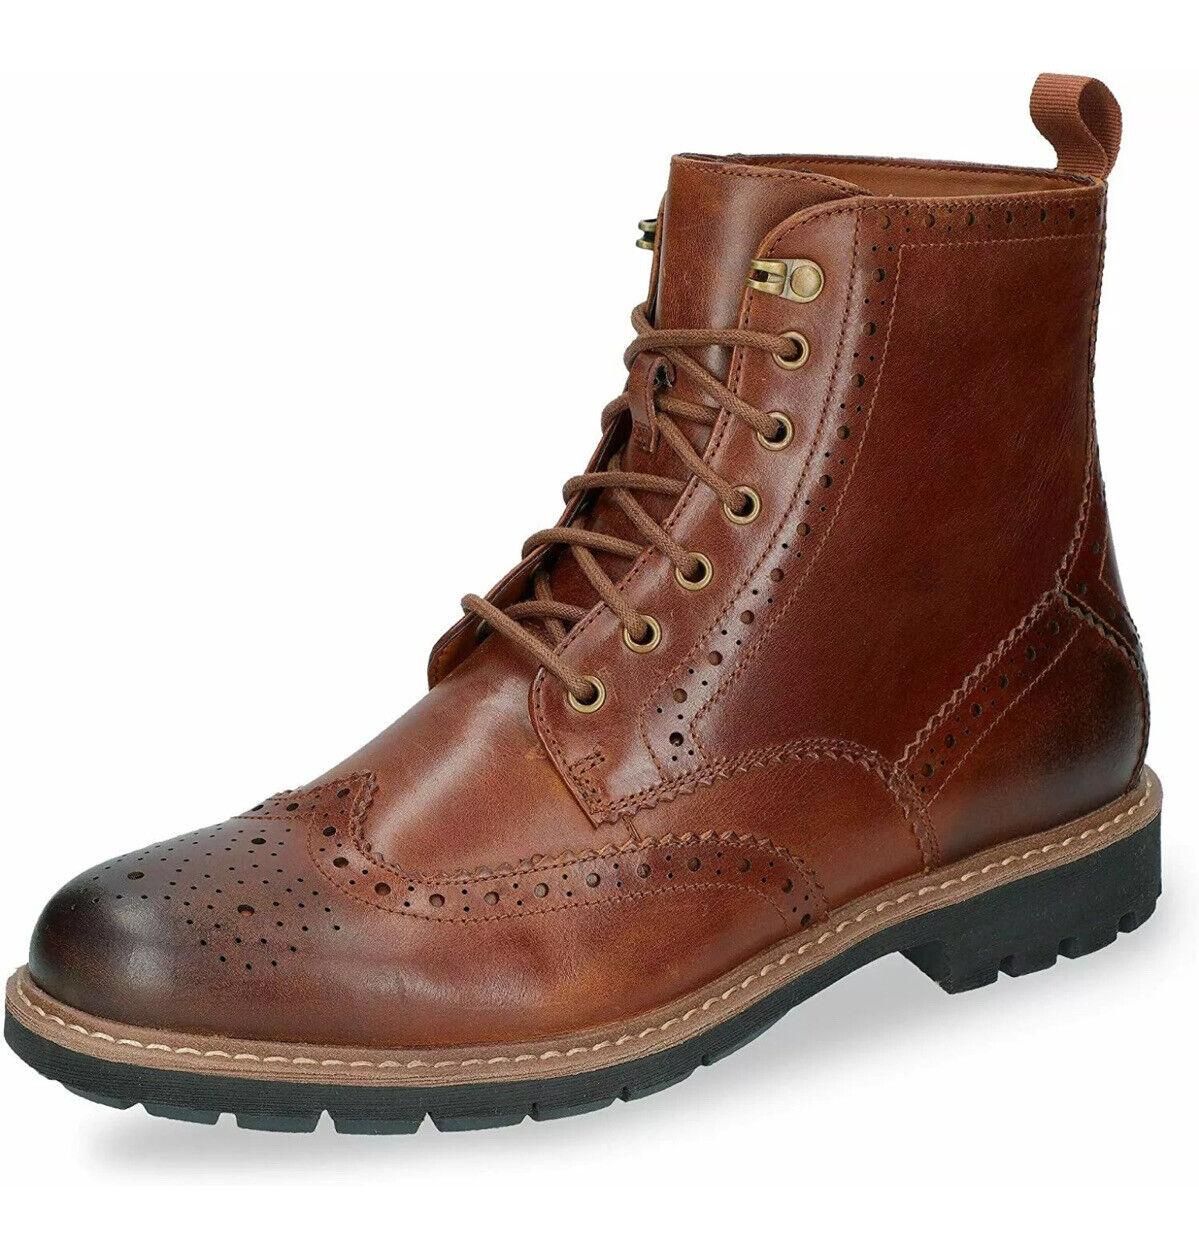 Clarks Batcombe Lord Brogue Dark Tan Leather Mens Boots Size UK 7.5 G (41.5EU)